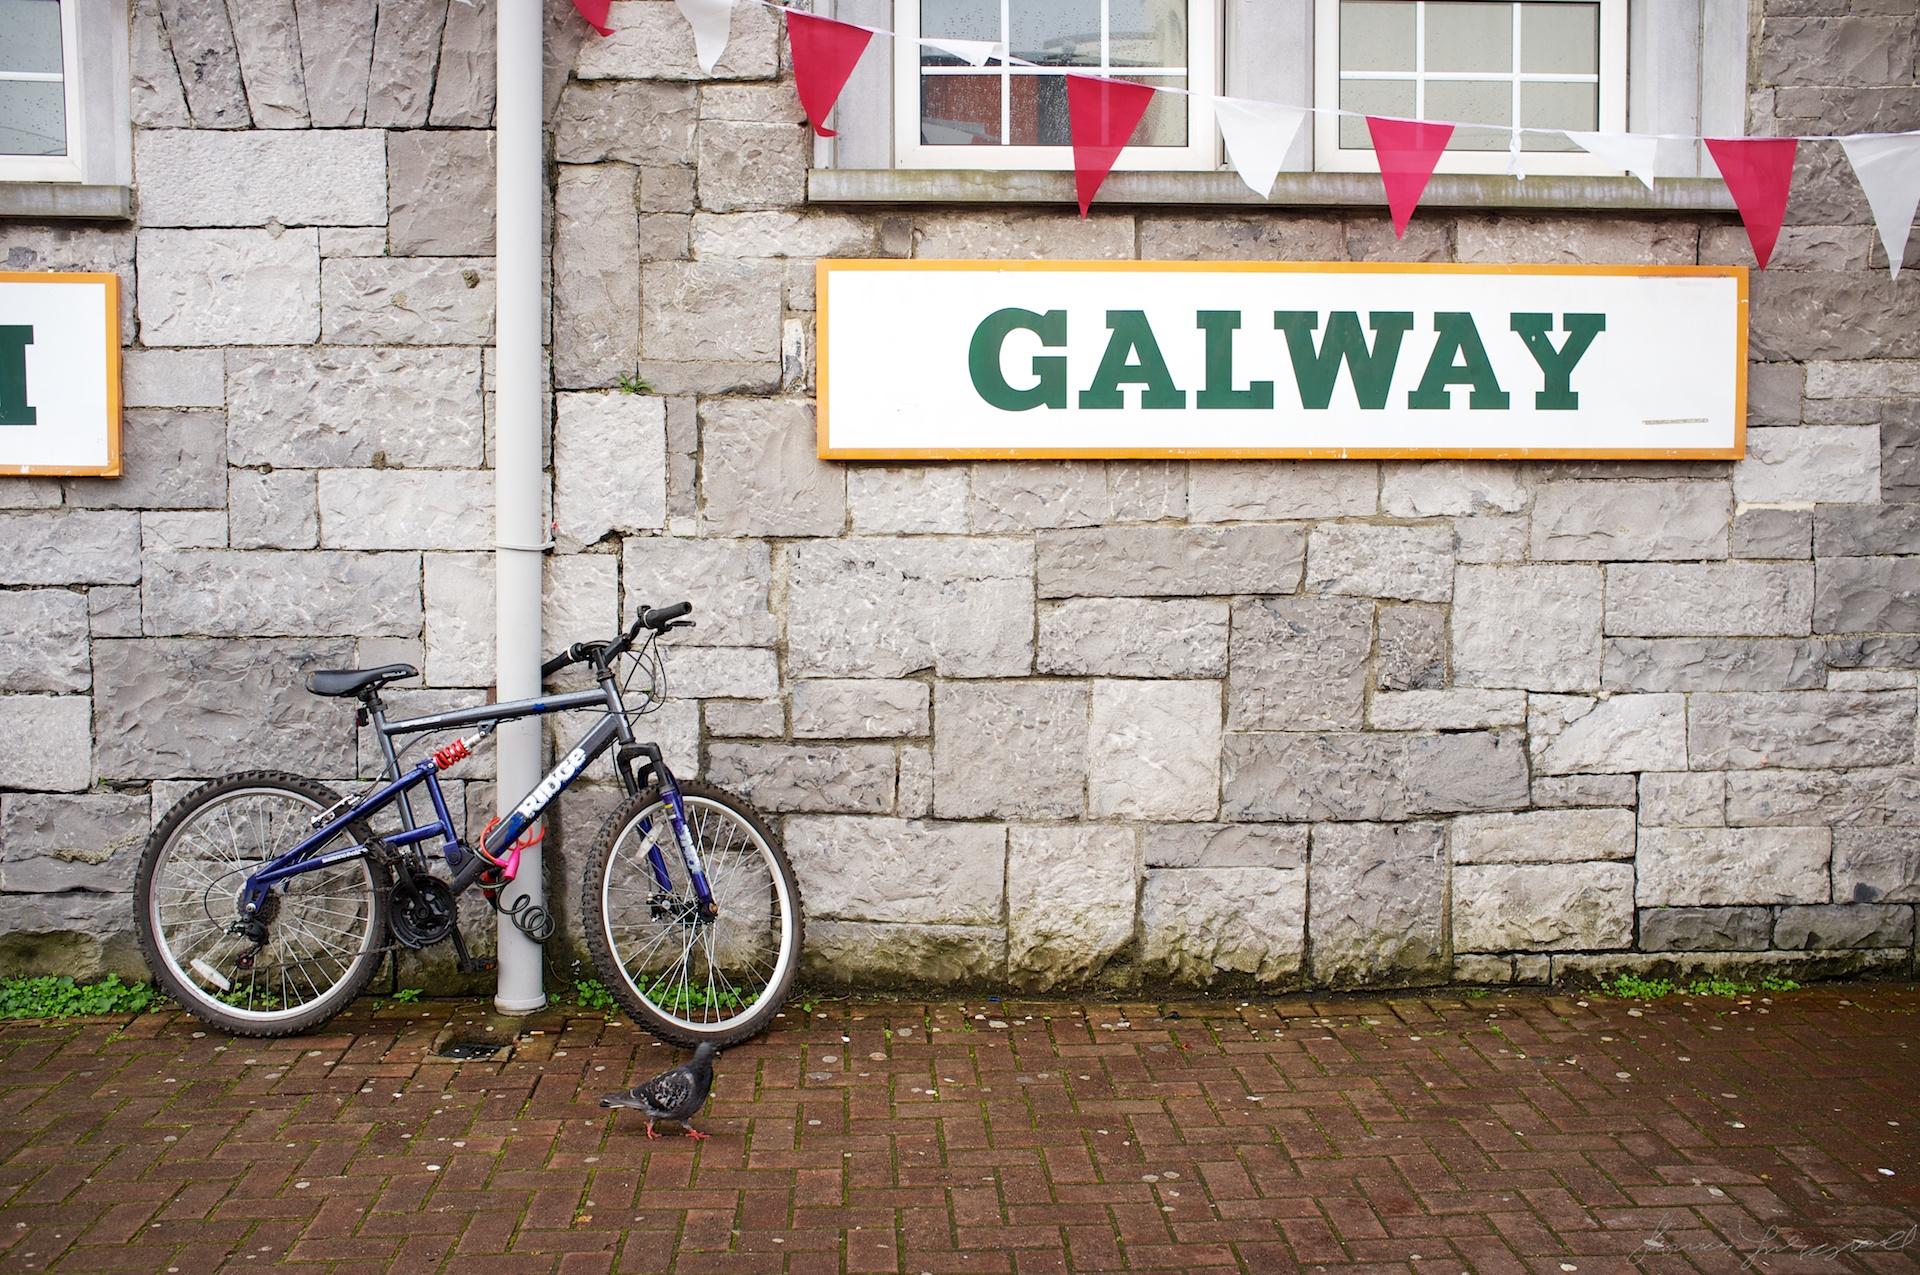 Galway railway station - Fuji X100